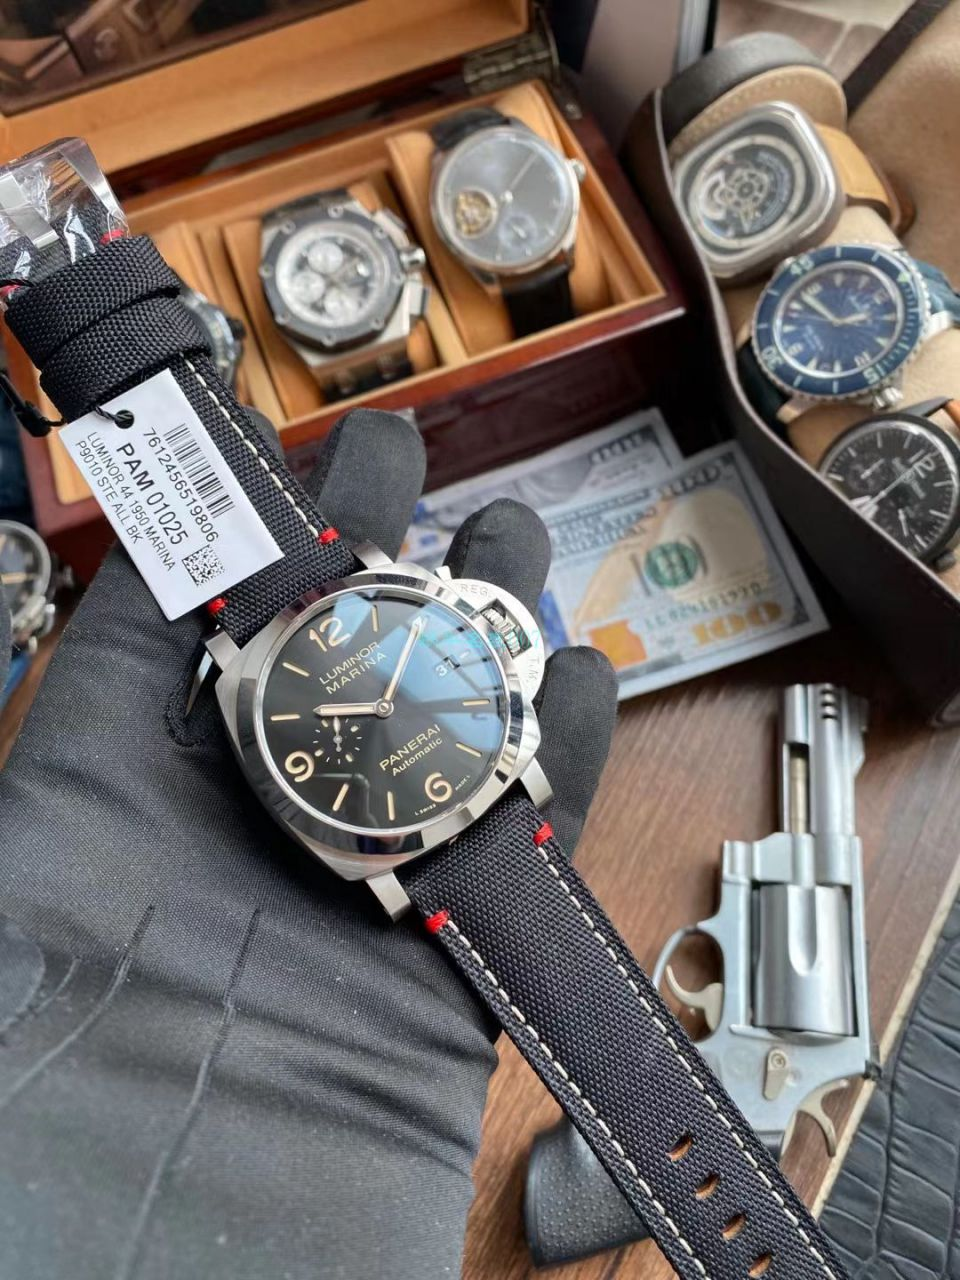 VS厂沛纳海Luminor Marina系列PAM01025顶级1比1复刻手表 / VSPAM01025